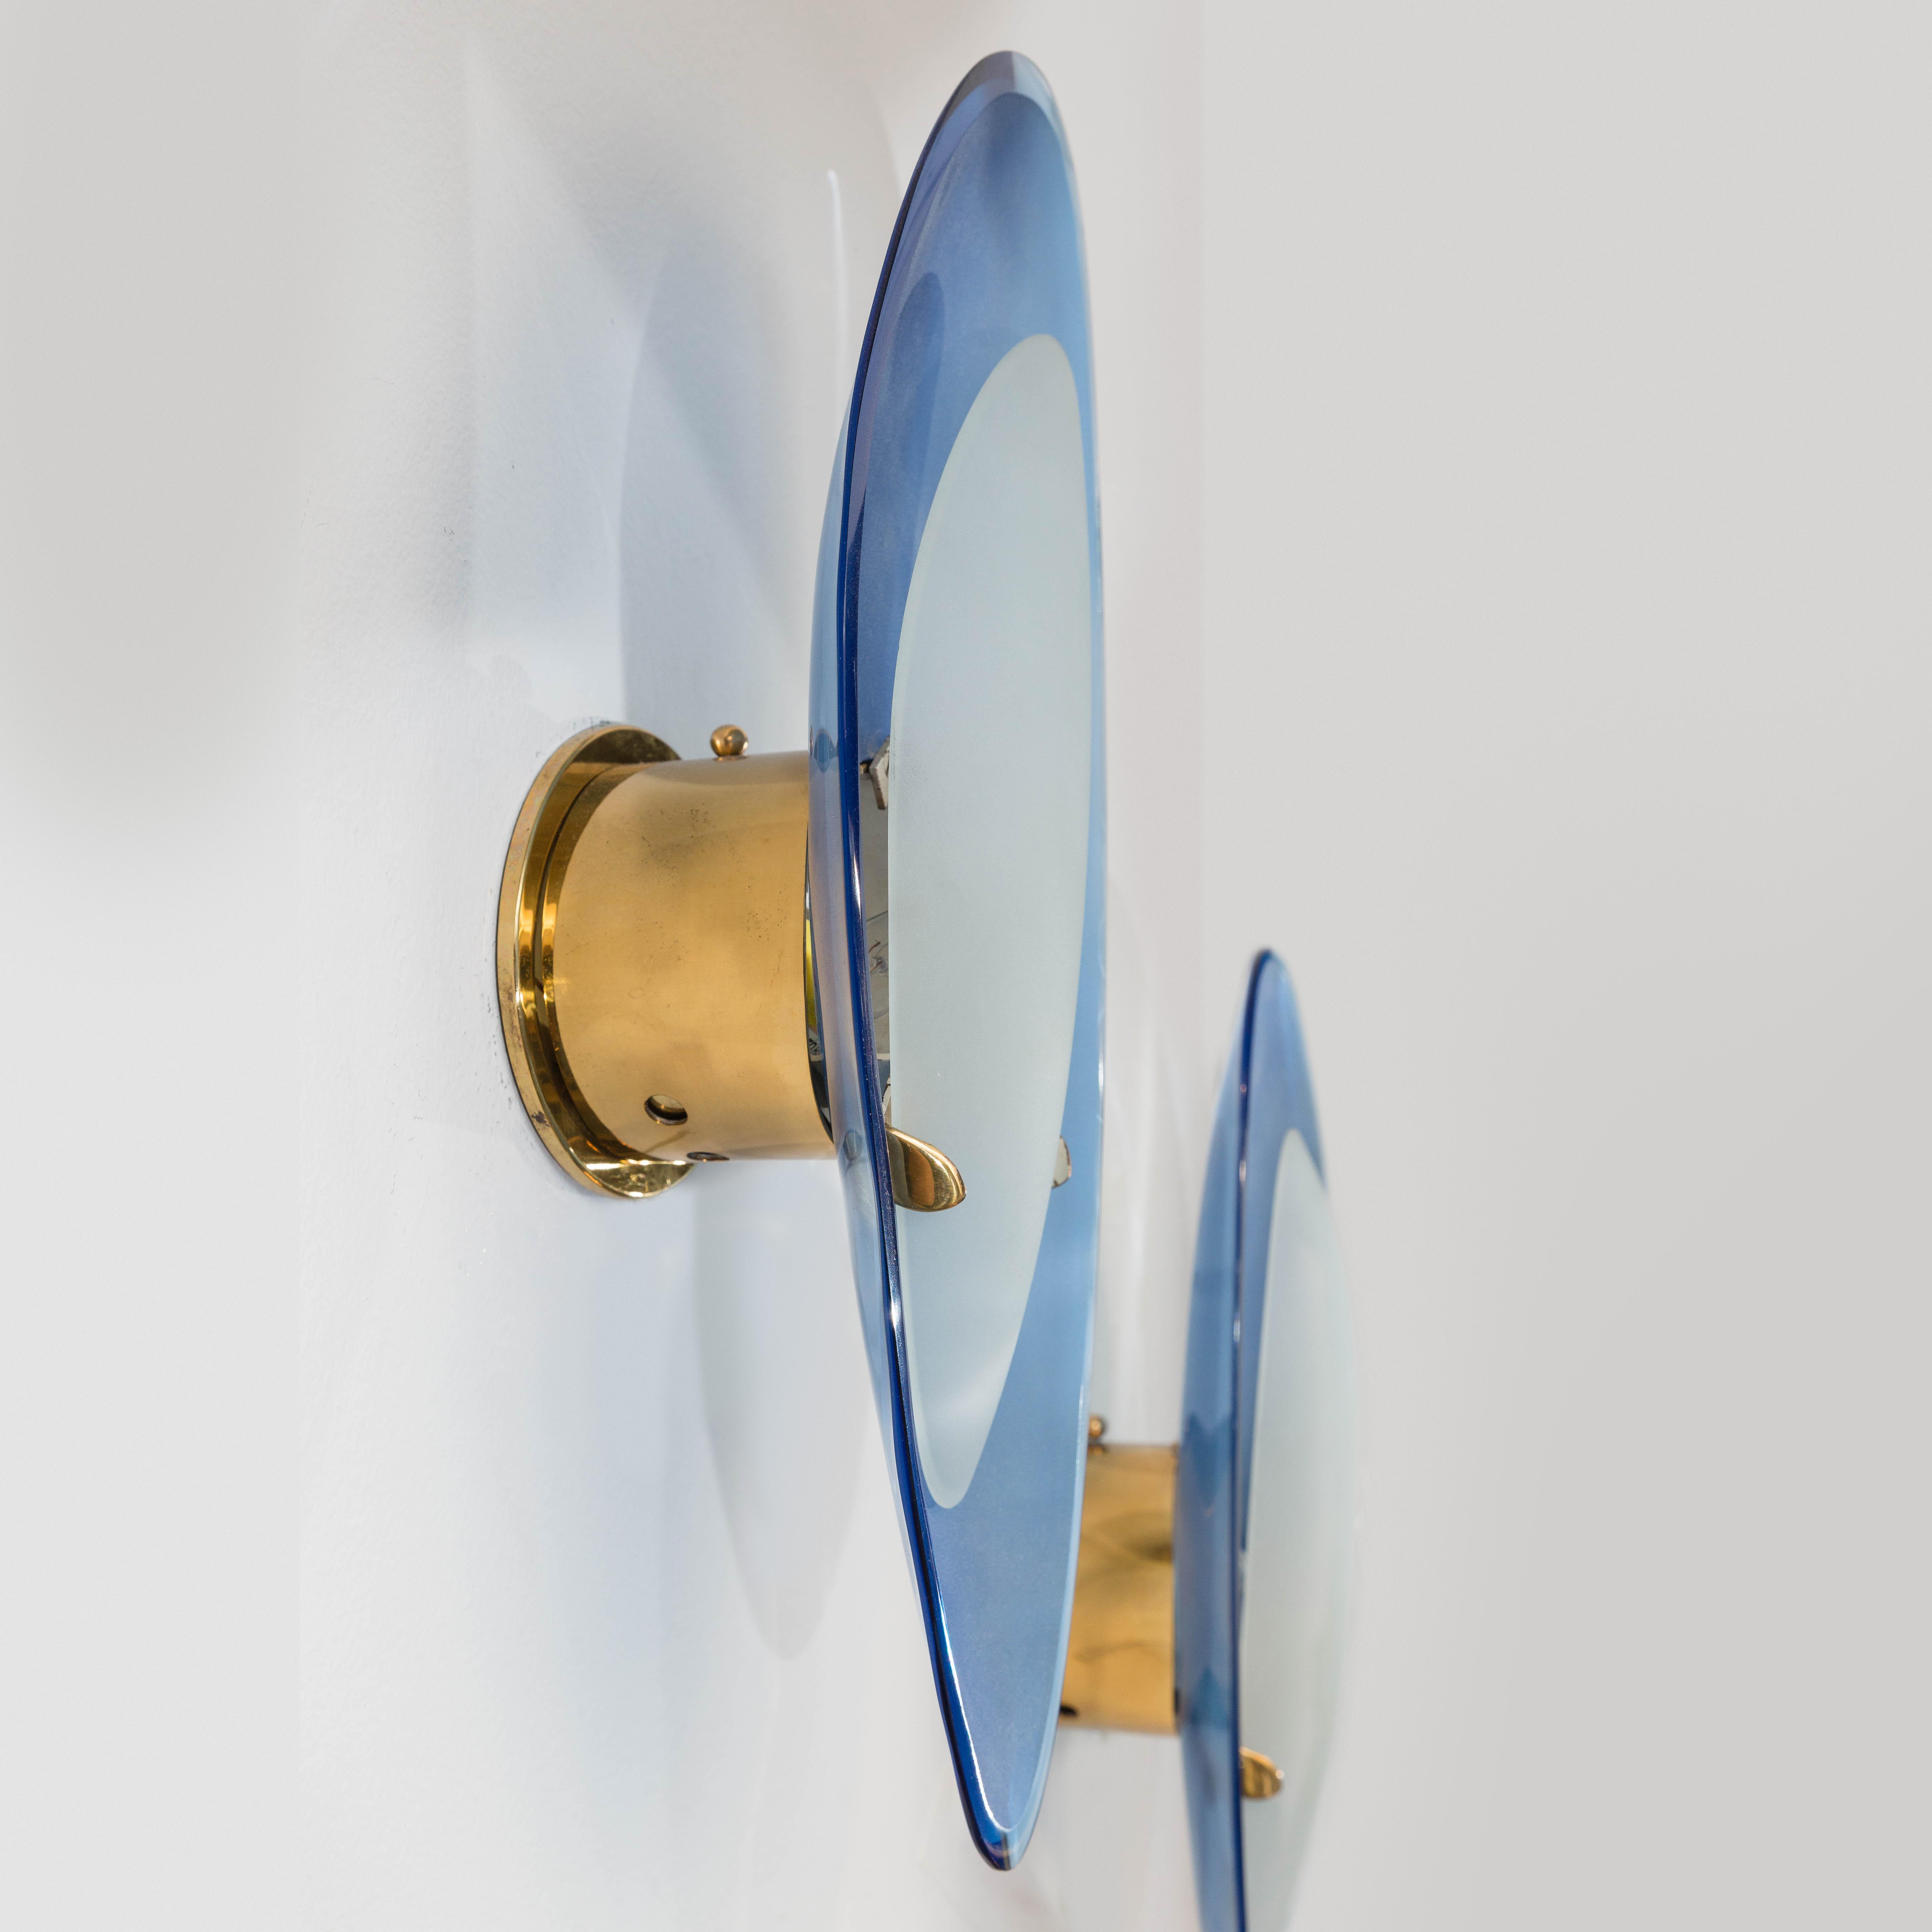 Pair of Rare Sconces by Max Ingrand for Fontana Arte | soyun k.